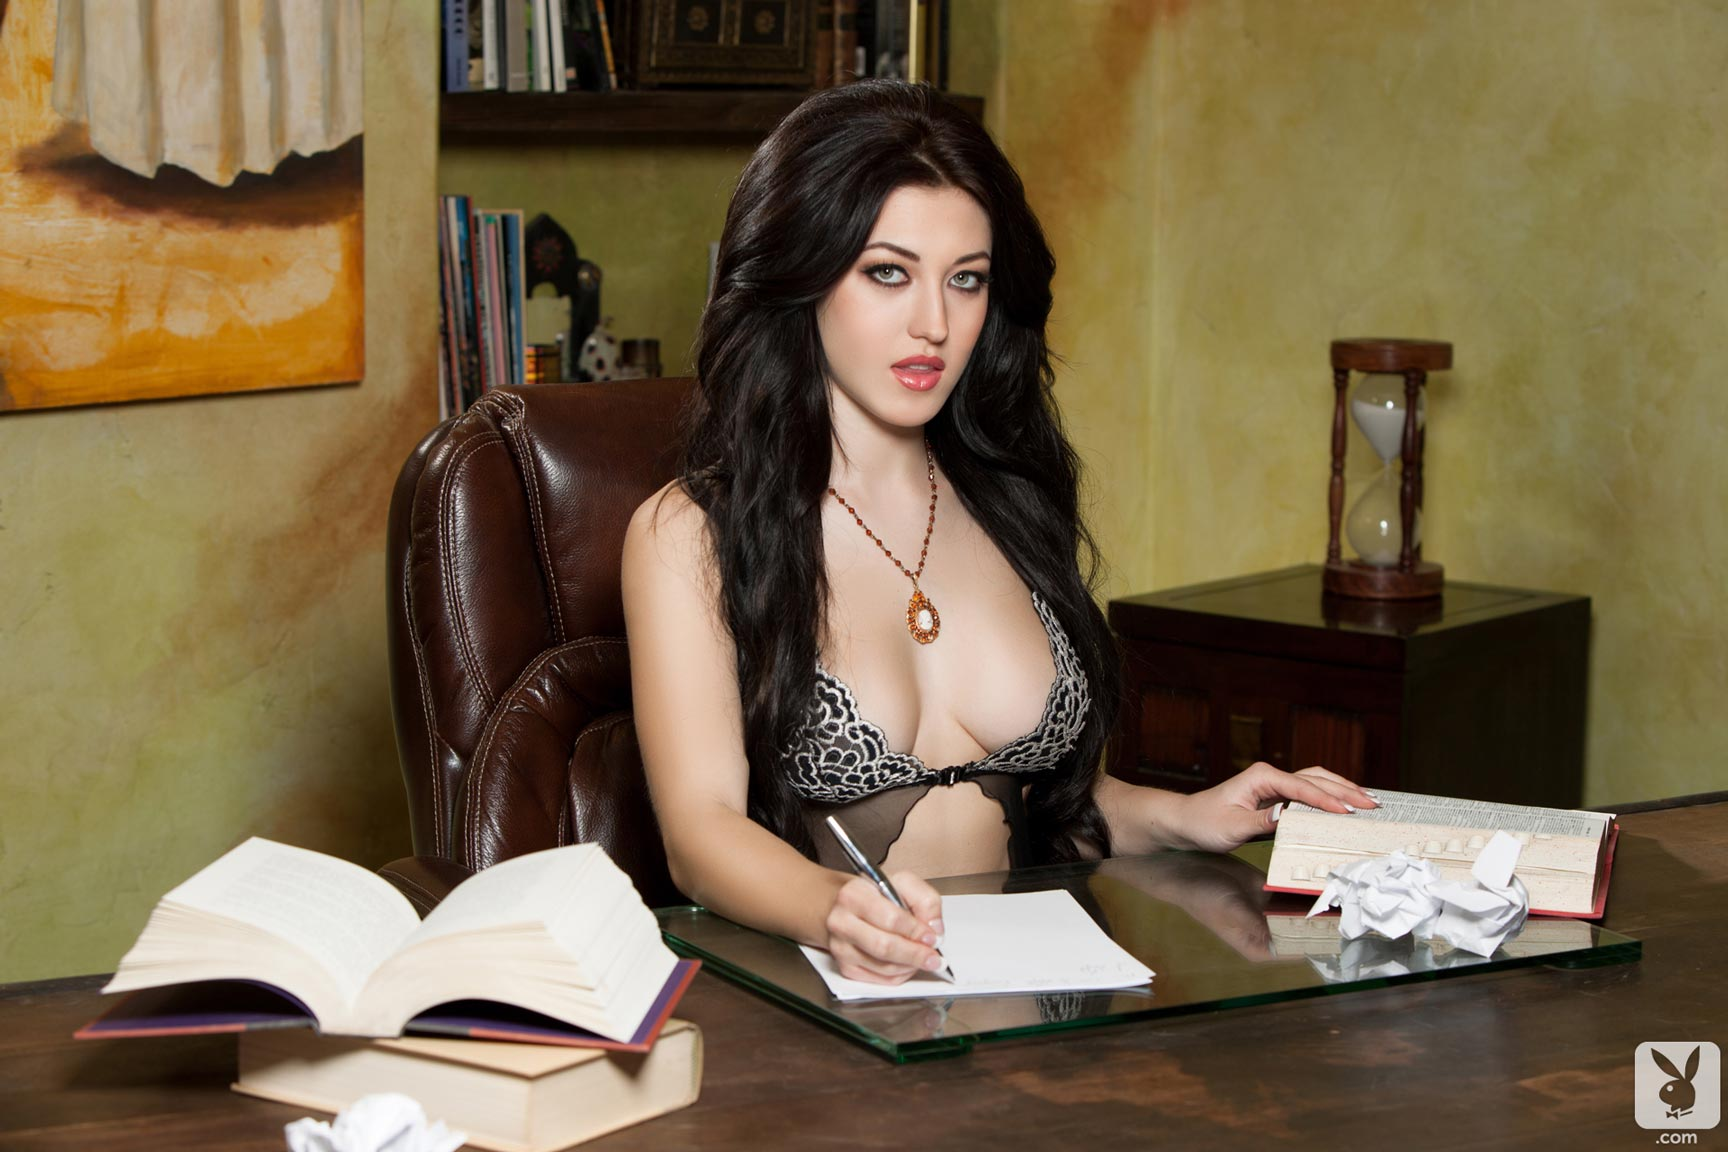 Playboy Cybergirl Stefanie Knight flashing her sexy assets ...